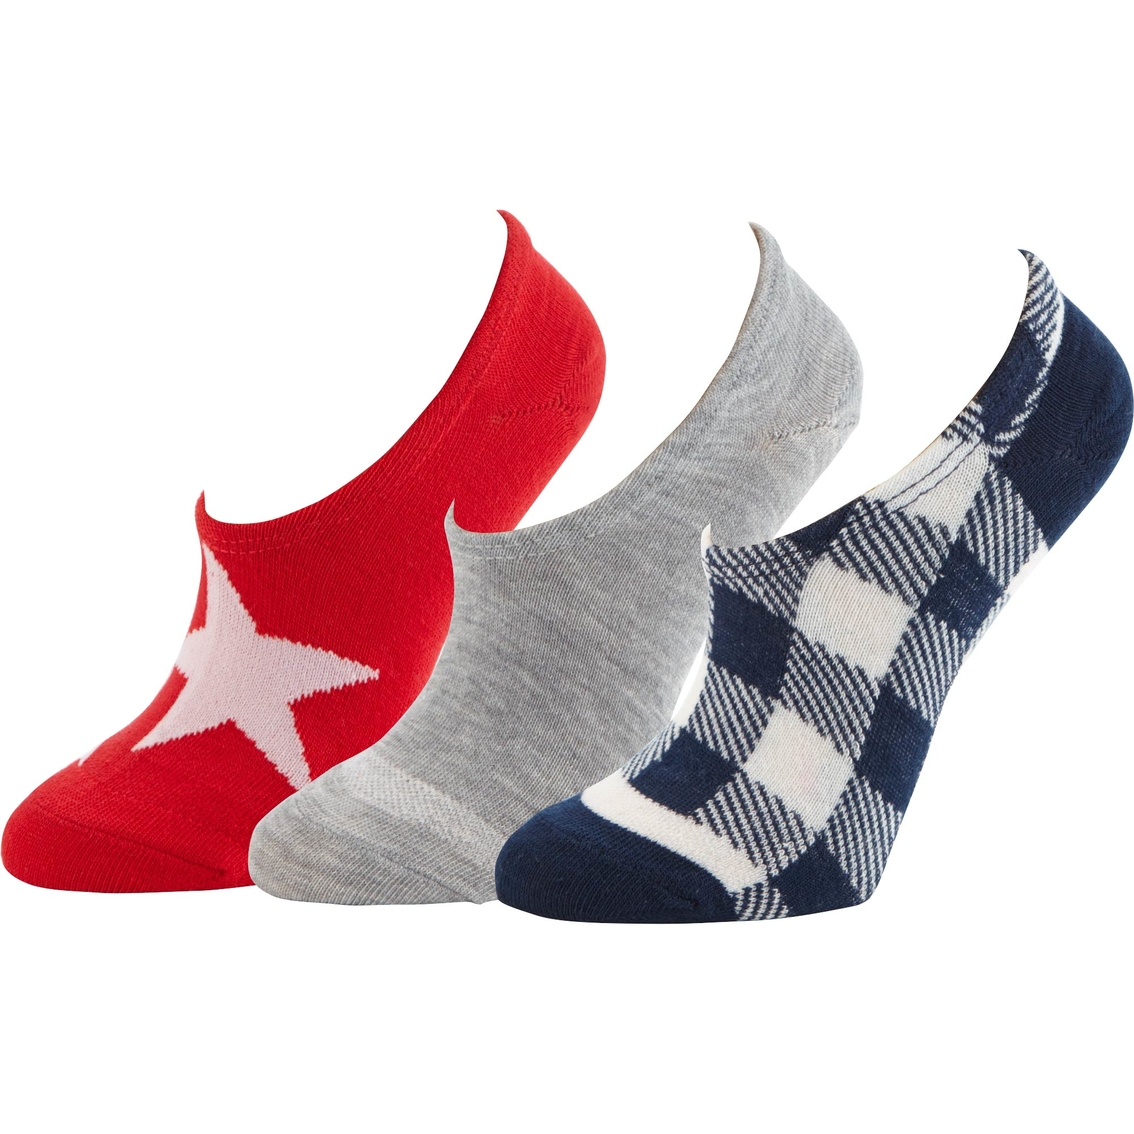 d849dd4a5a99 Converse Buffalo Check Combo Ultra Low Hidden Sock Liners 3 Pk ...